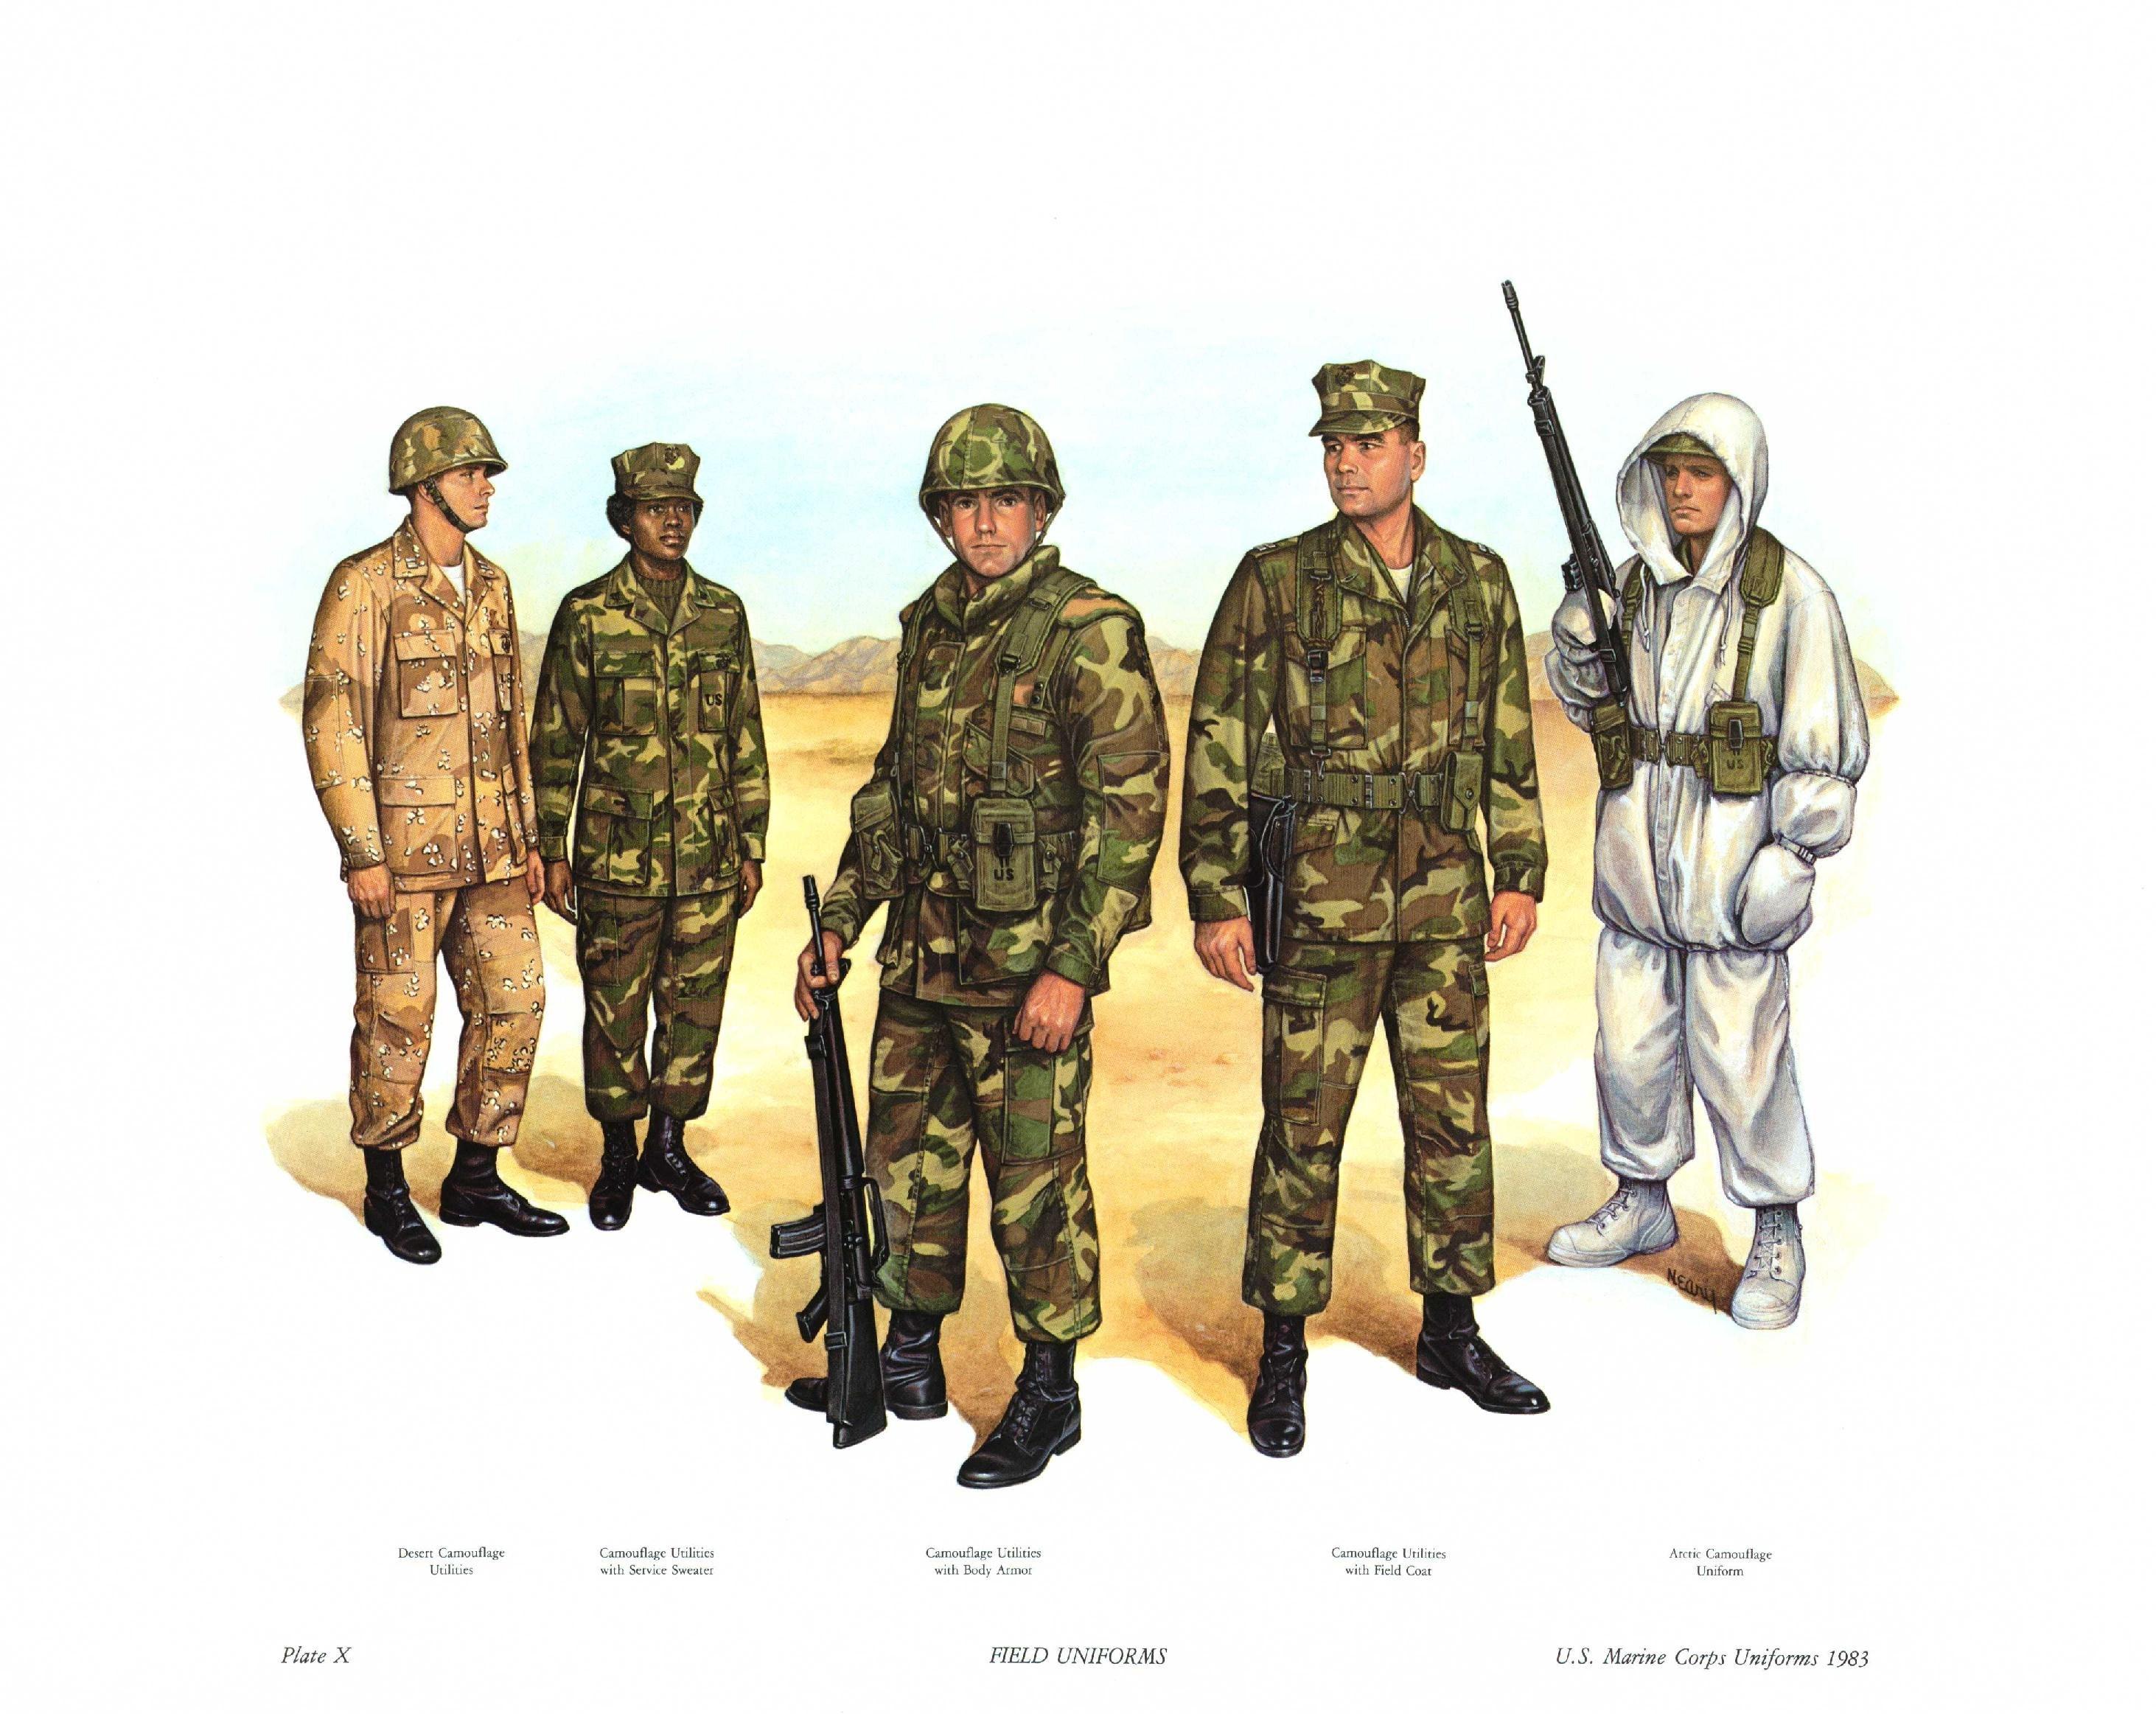 File:Plate X, Field Uniforms.